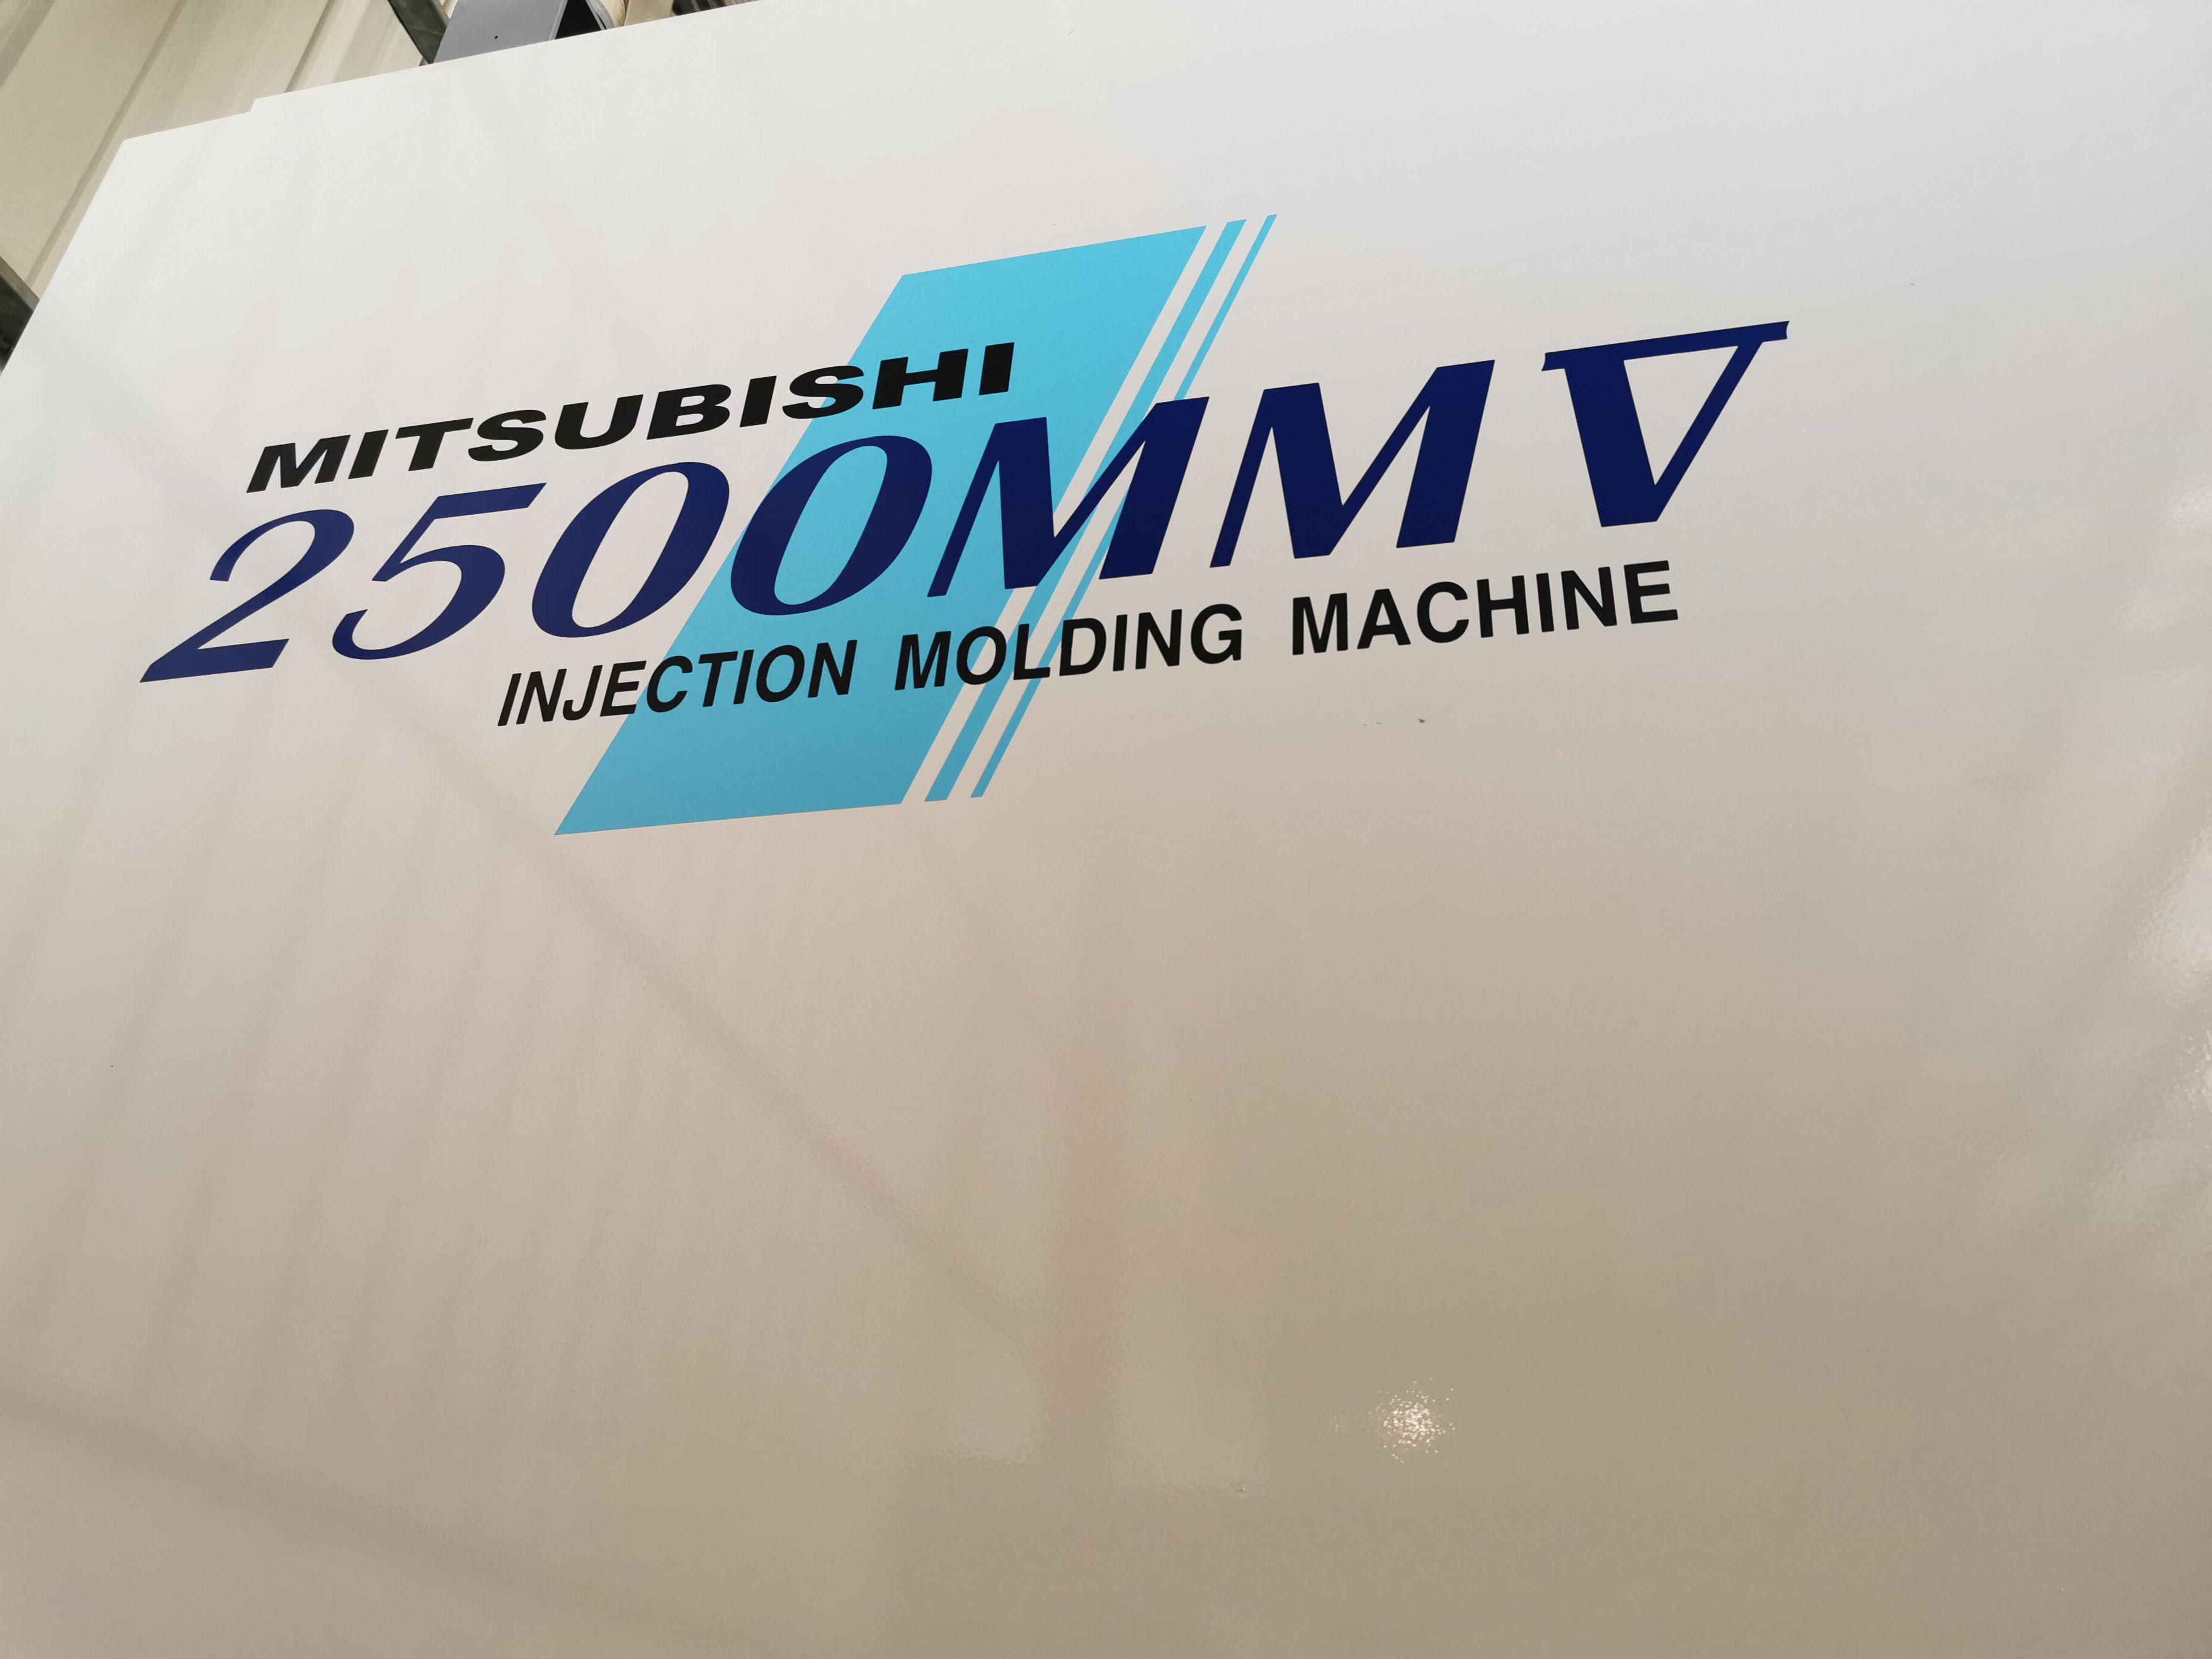 Mitsubishi 2500t used Plastic Injection Molding Machine Featured Image